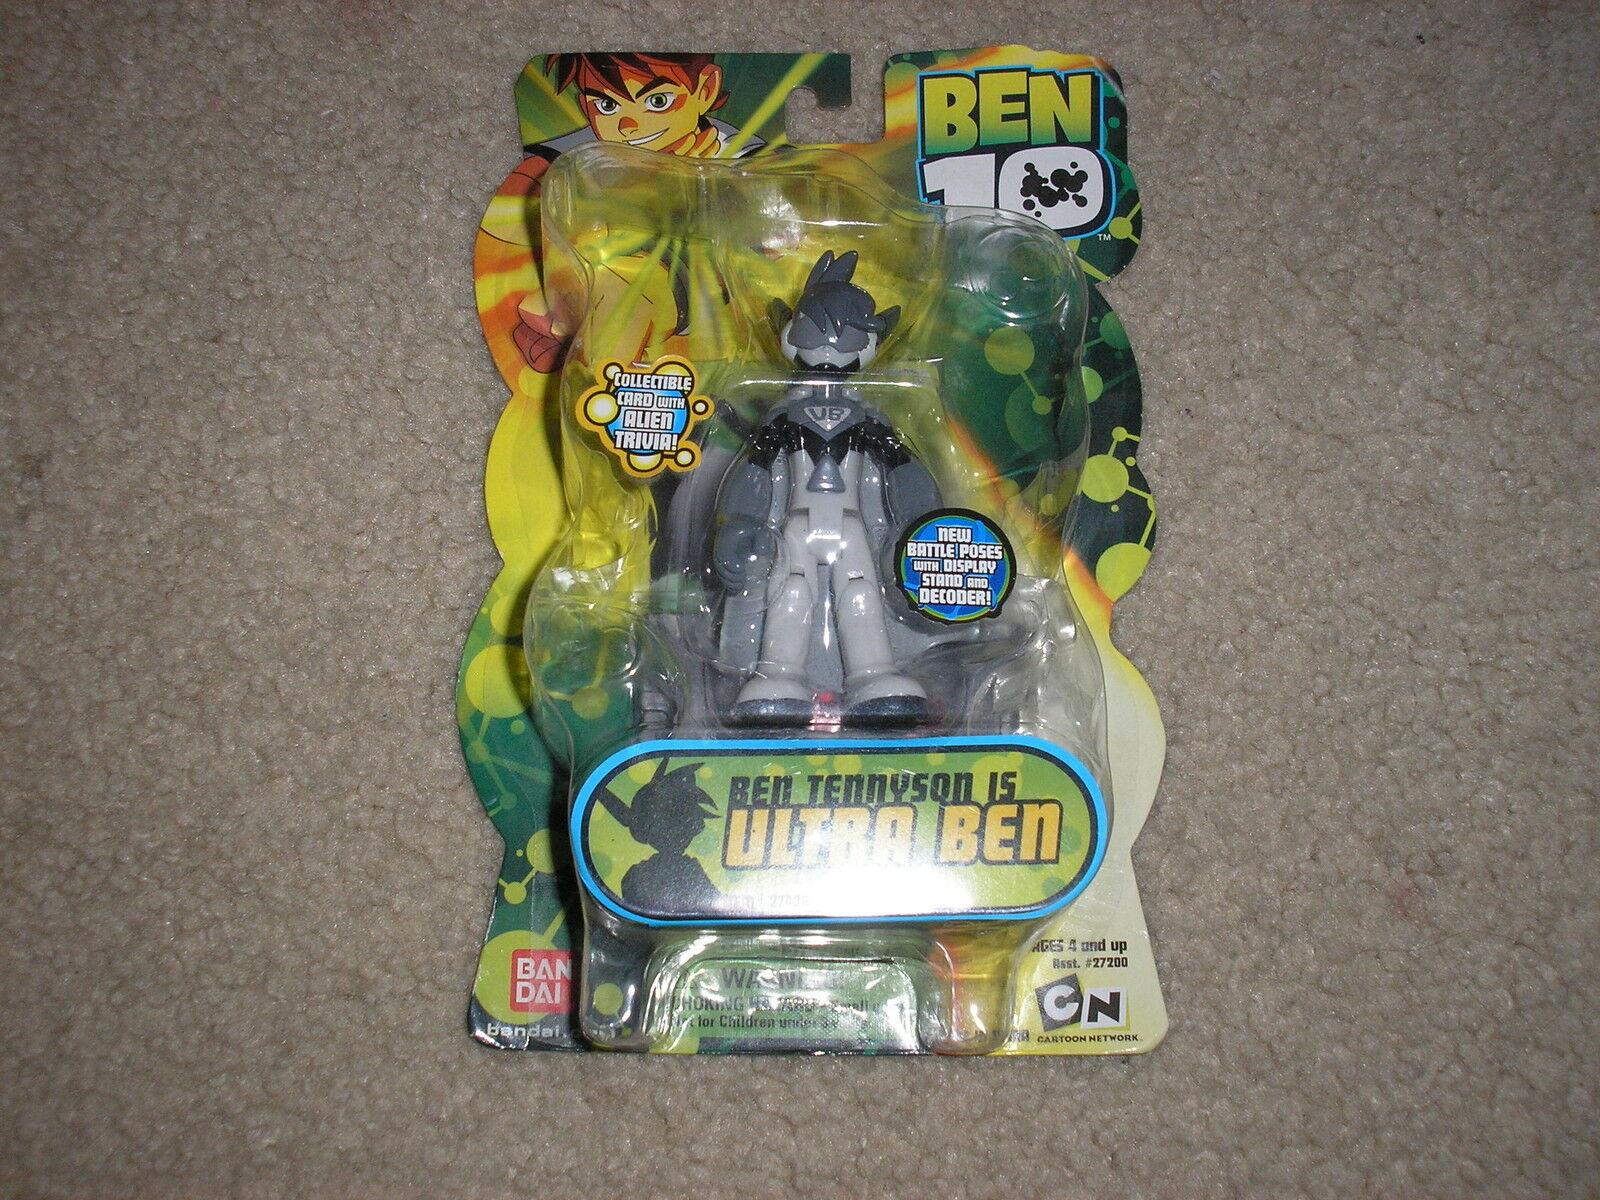 New Ben 10 Figure Ben Tennyson is Ultra Ben Rare Hard to Find 4 Inch Figure